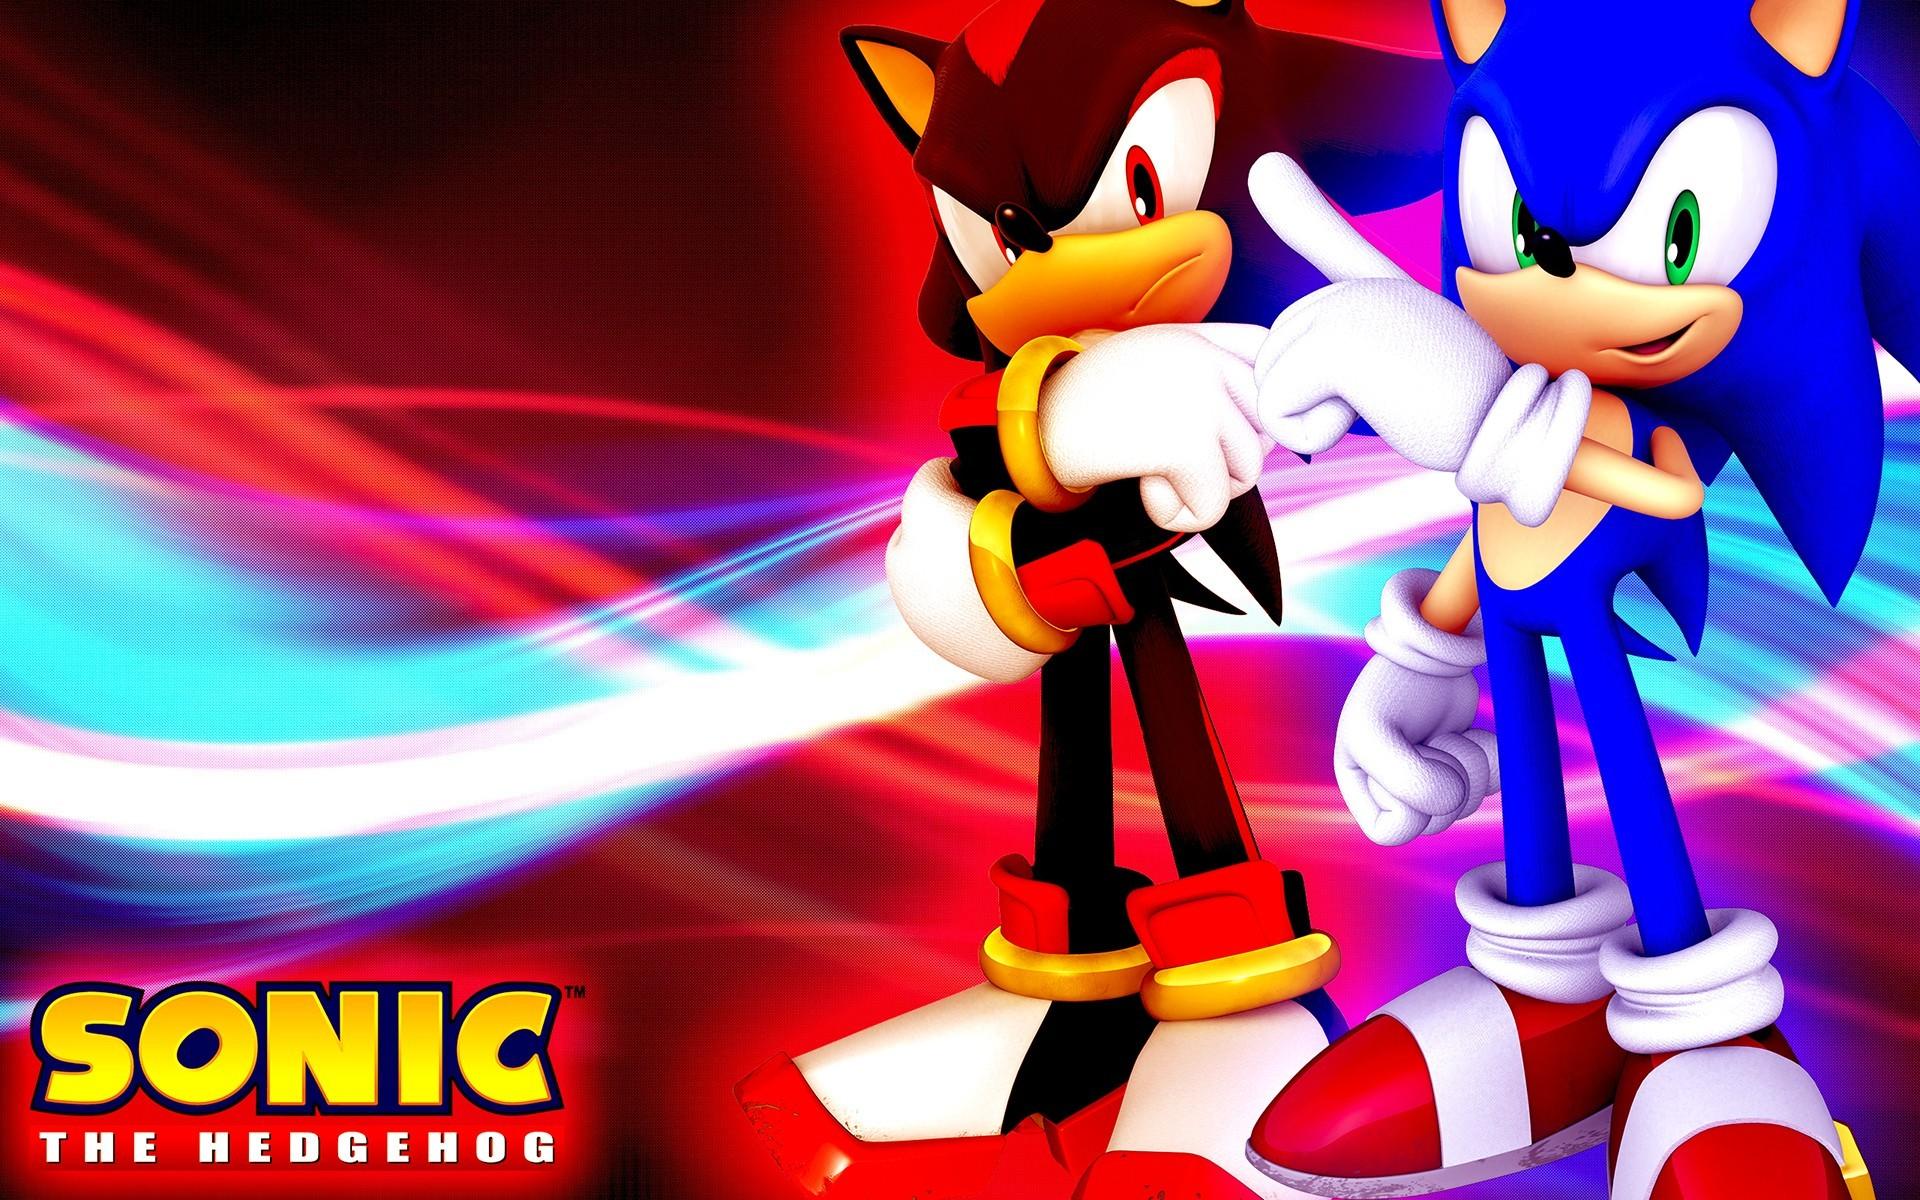 Video Game – Sonic the Hedgehog Shadow the Hedgehog Wallpaper